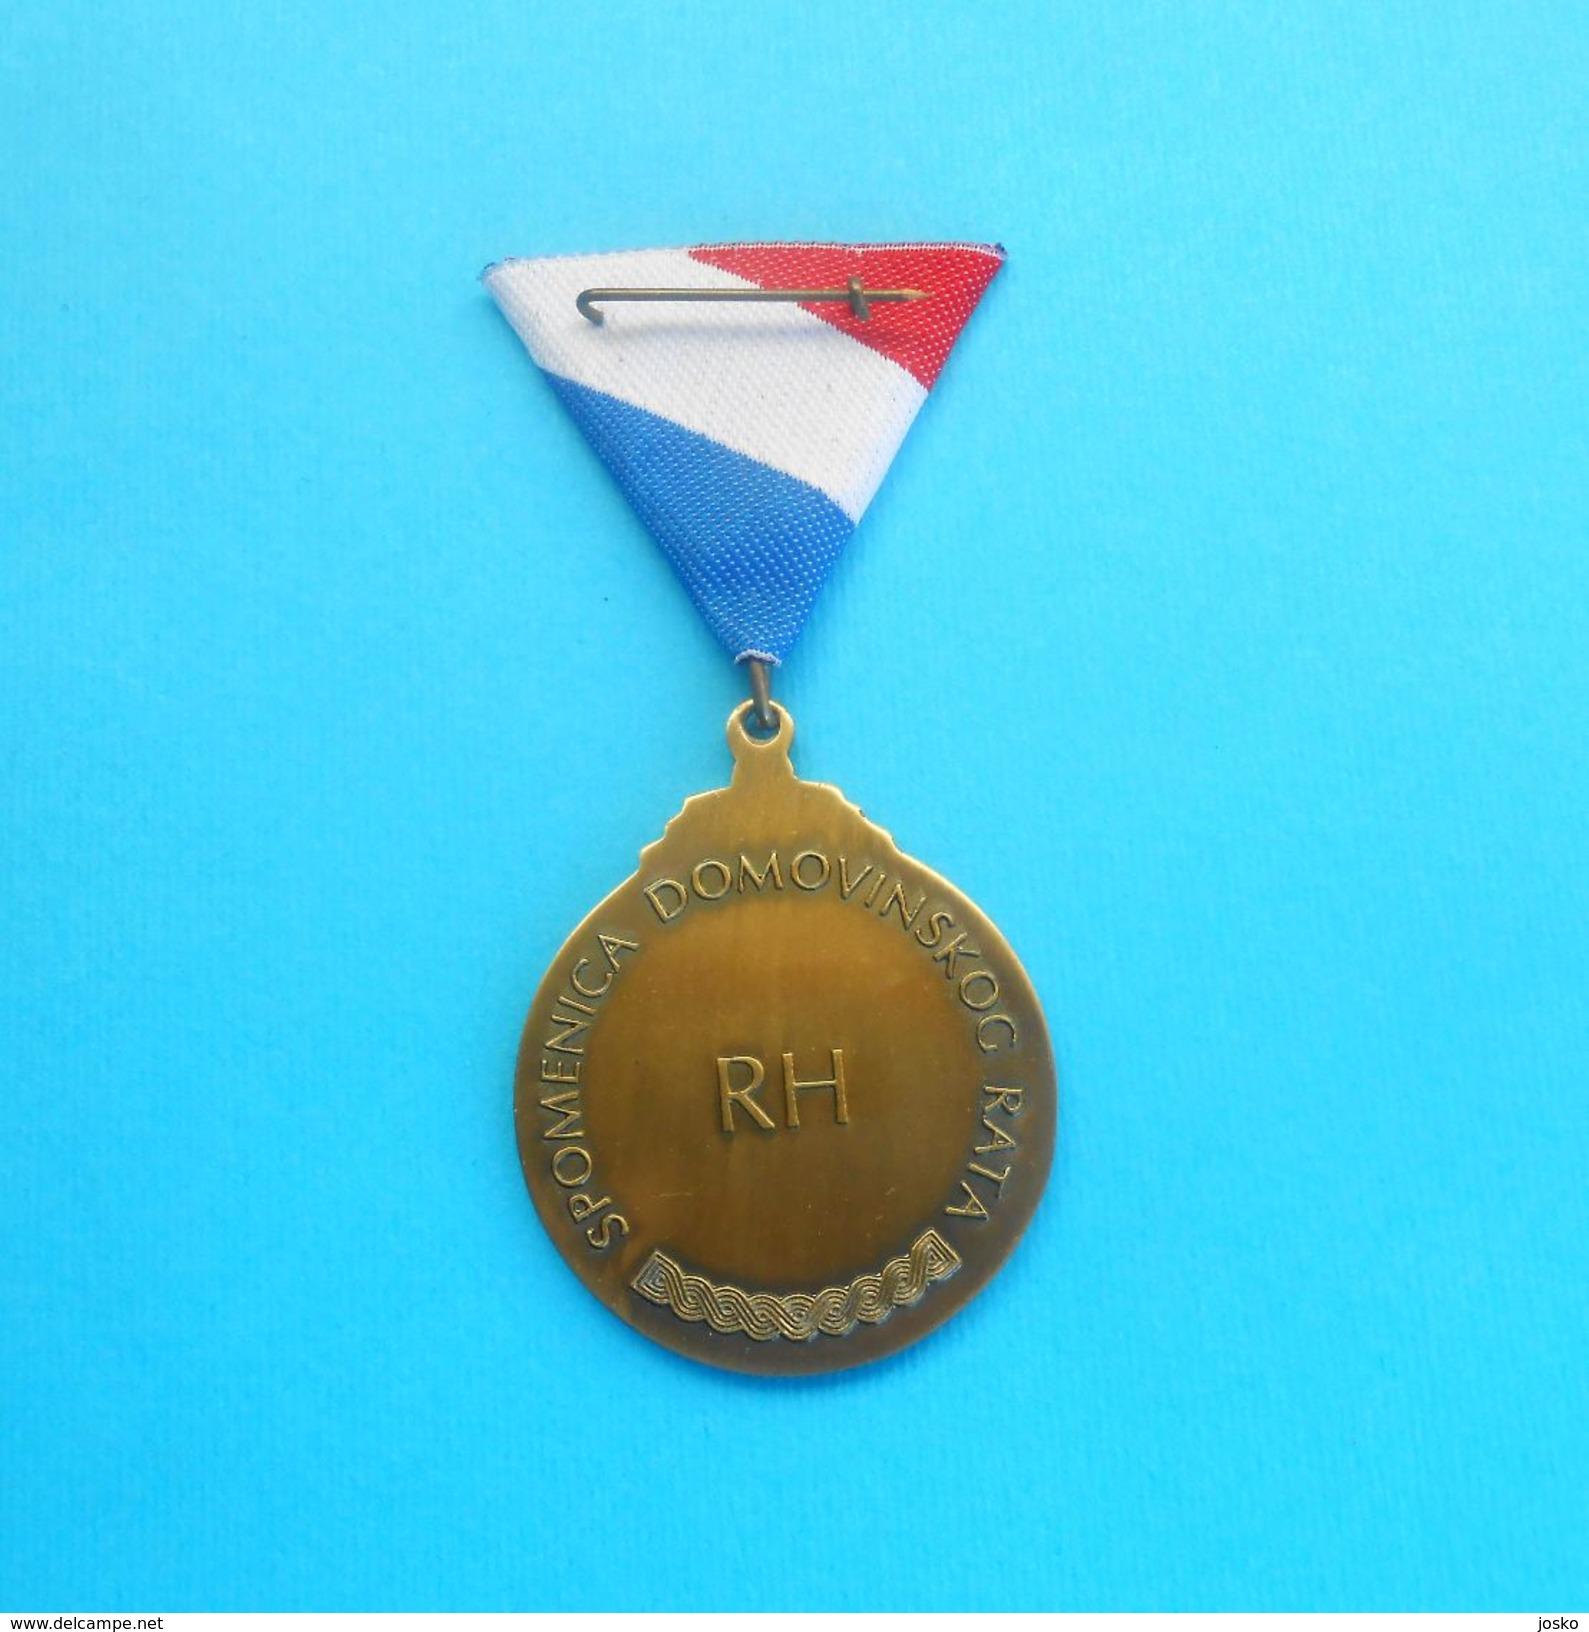 SPOMENICA DOMOVINSKOG RATA ( Homeland War Testimonial ) - CROATIA MEDAL  IN ORIGINAL BOX  ** PERFECT ** Croatie Kroatien - Medals